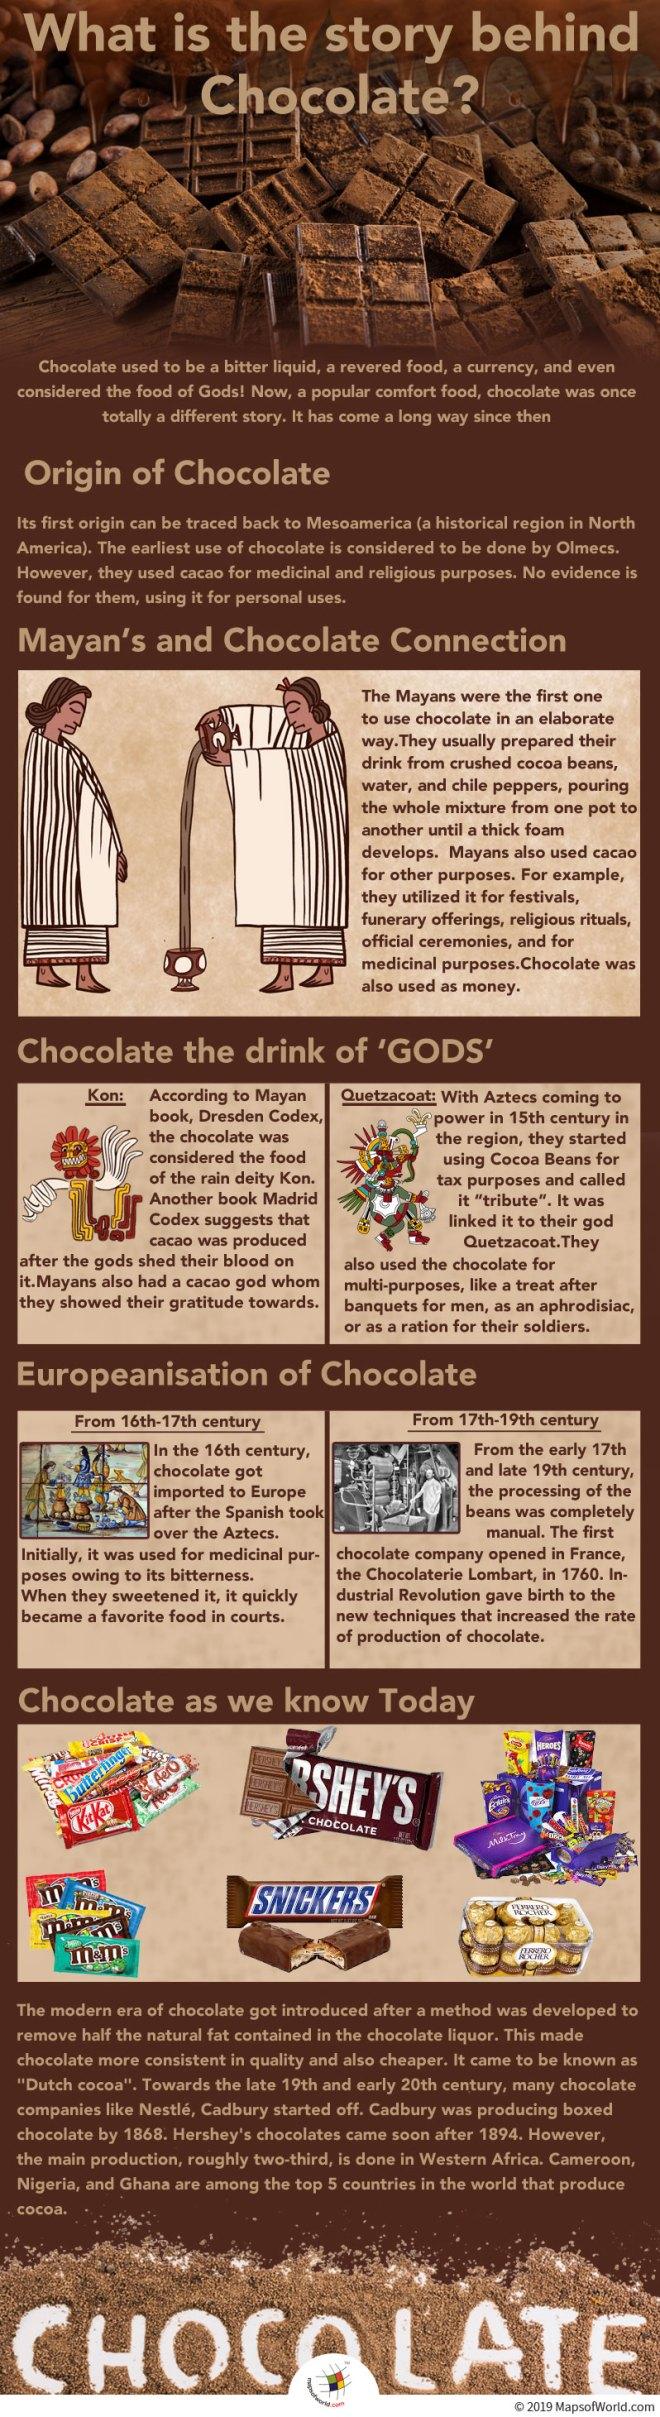 Infographic Depicting Information on Chocolate Origin